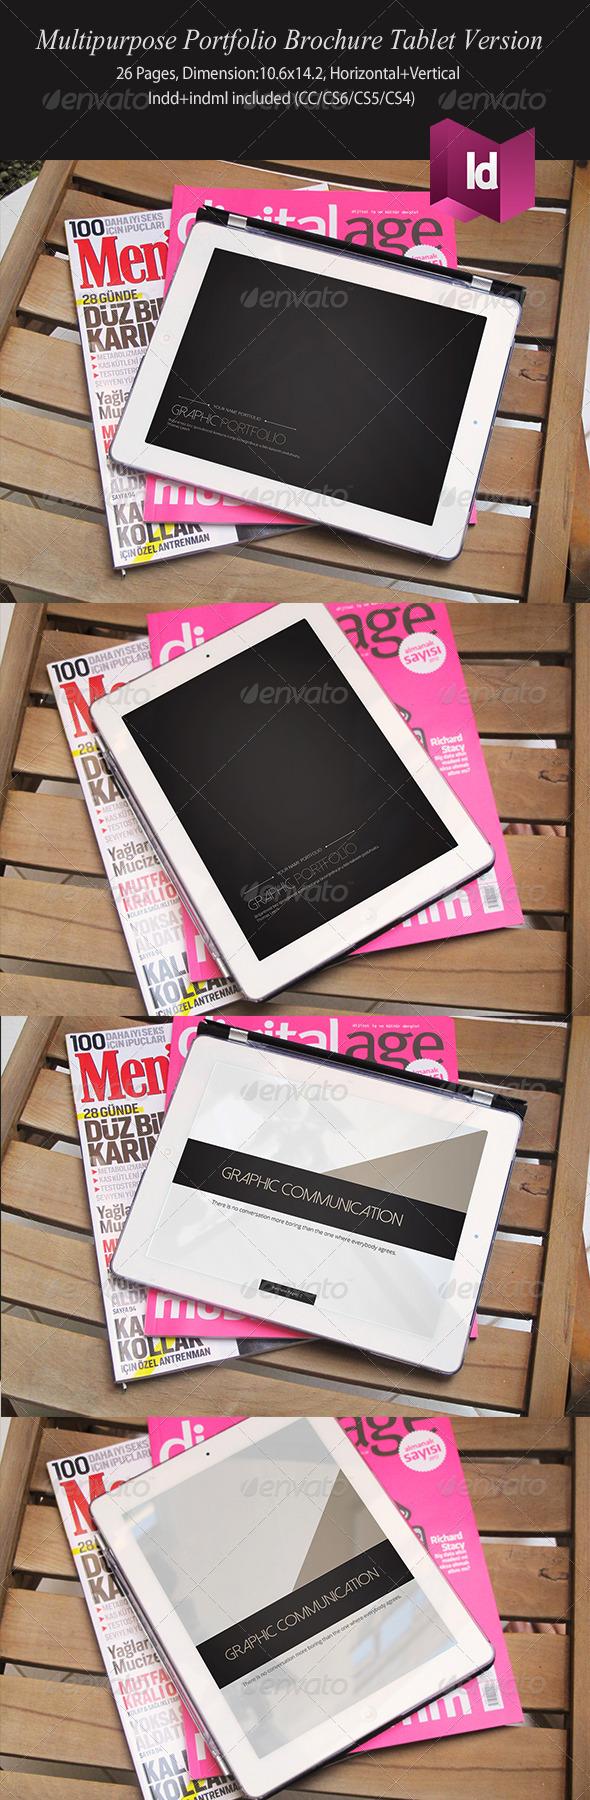 Multipurpose Portfolio Brochure Tablet Version - Digital Books ePublishing